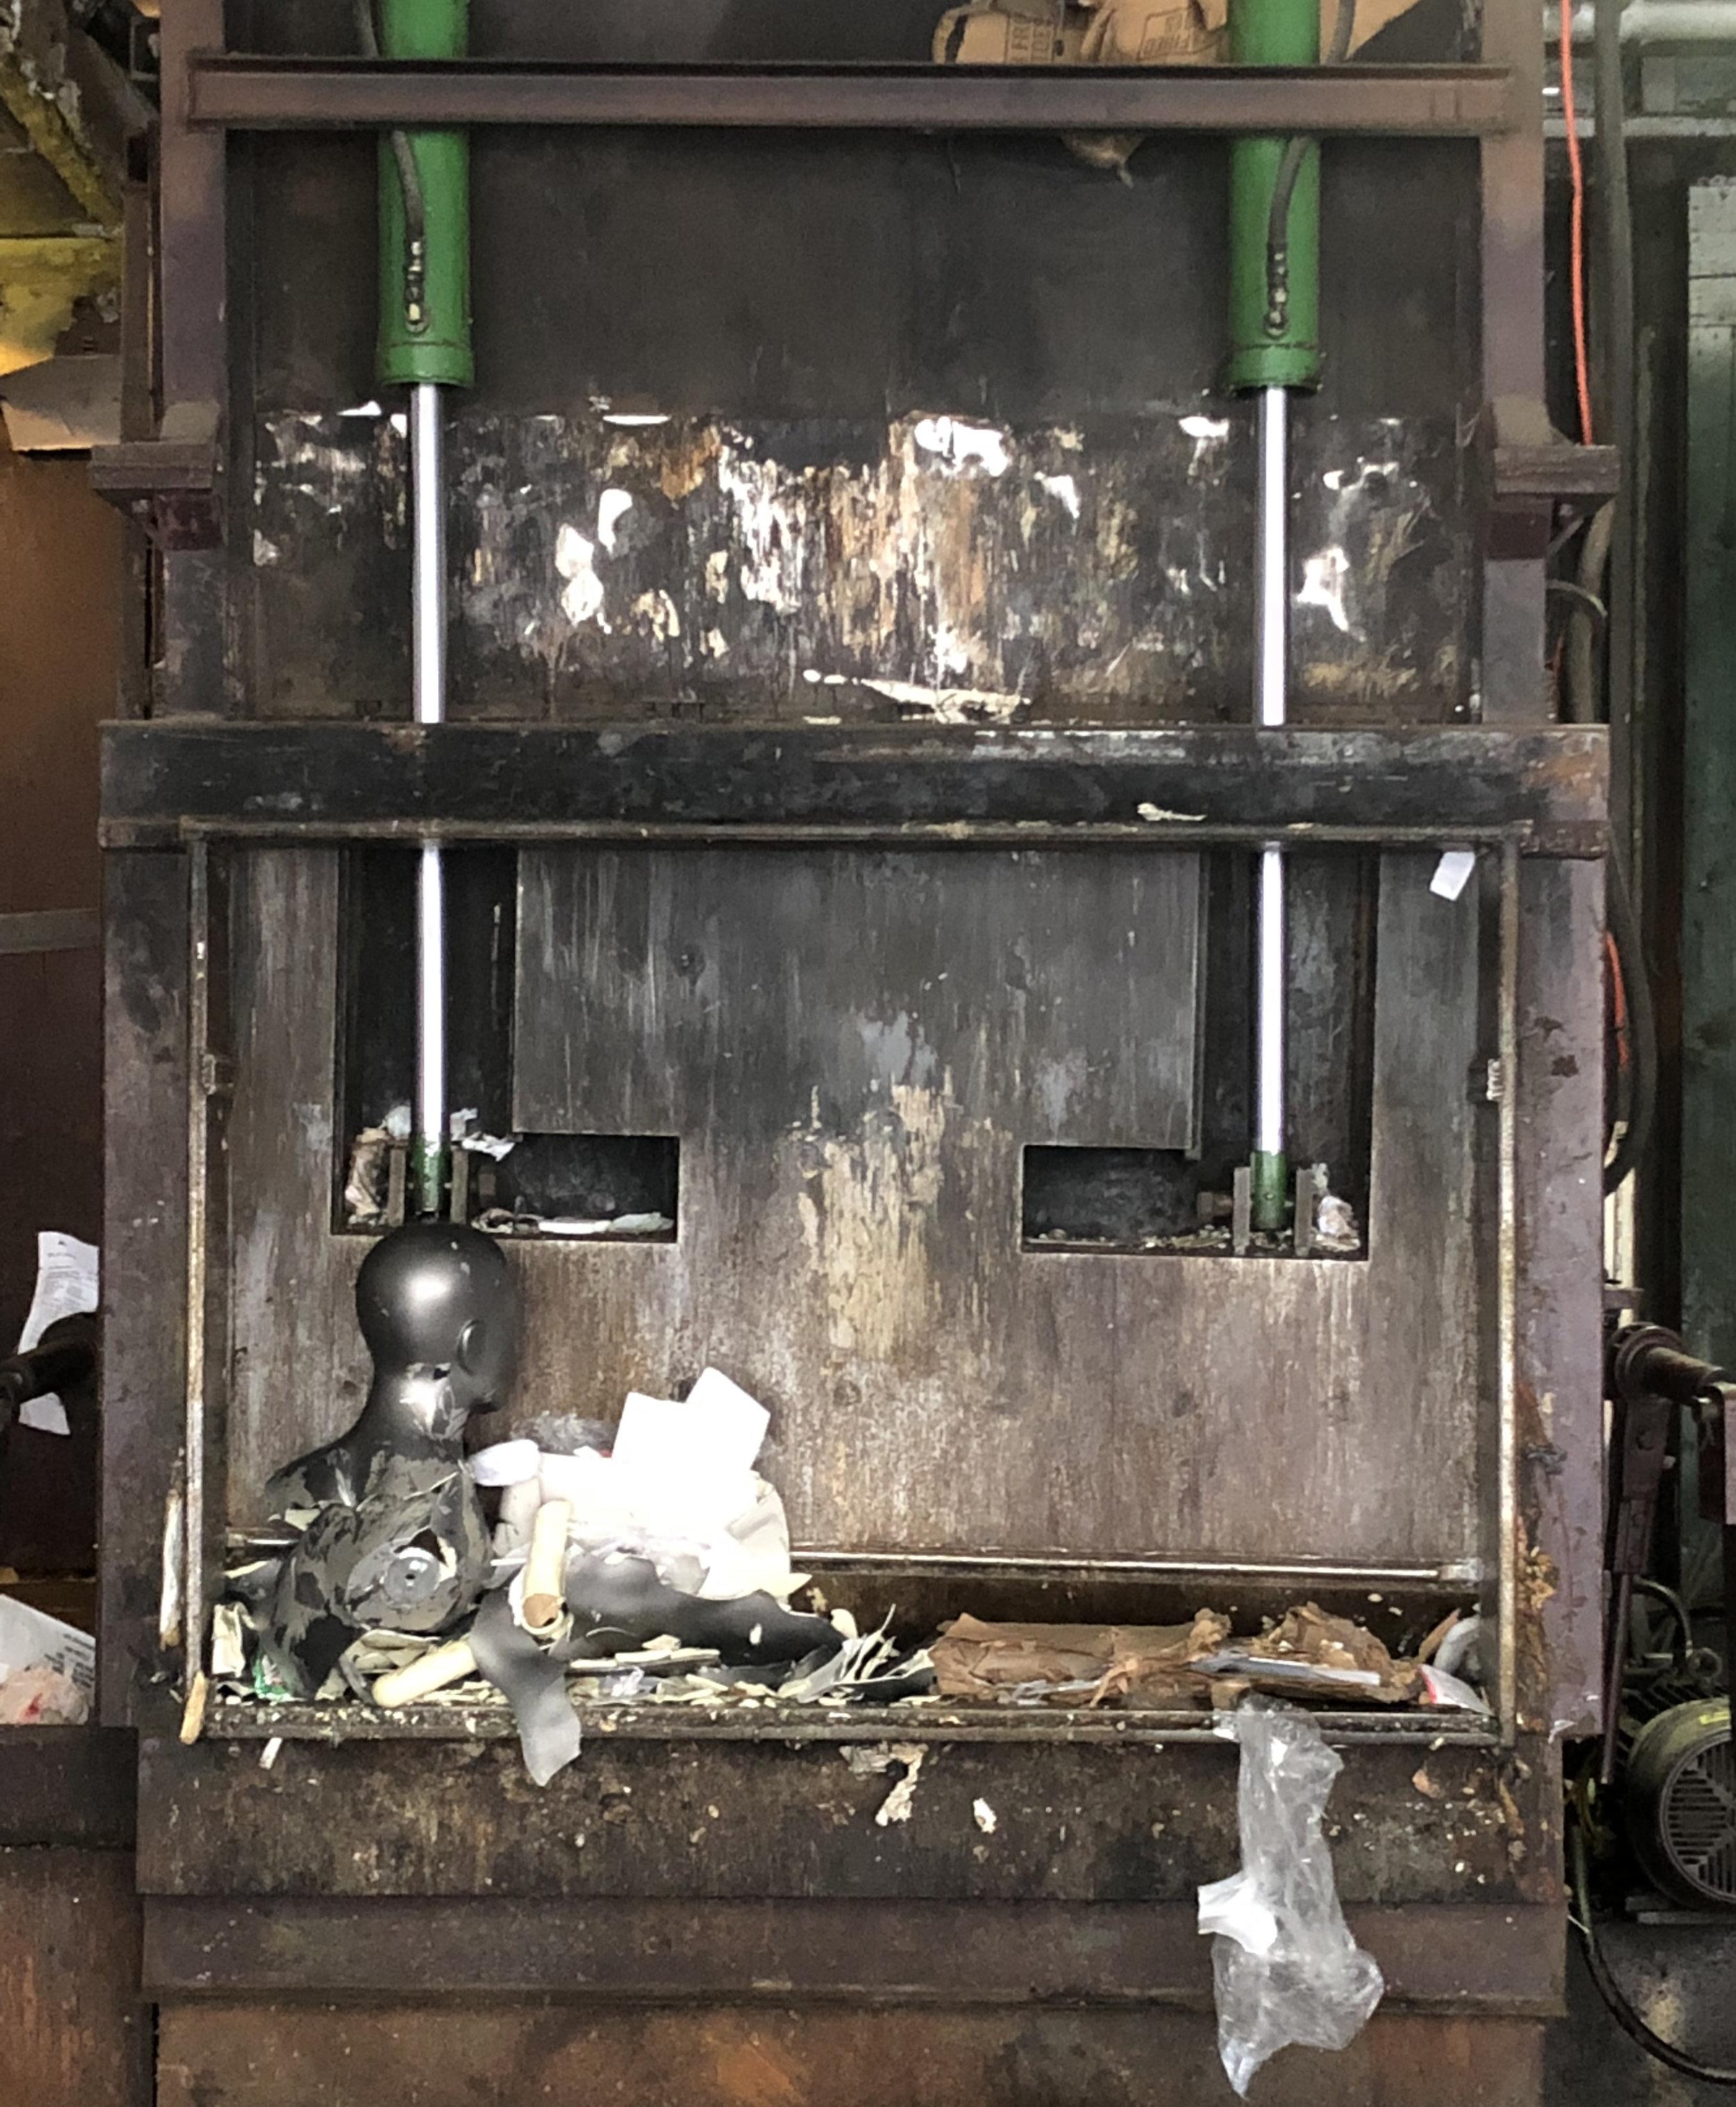 Manequin Trash Compactor